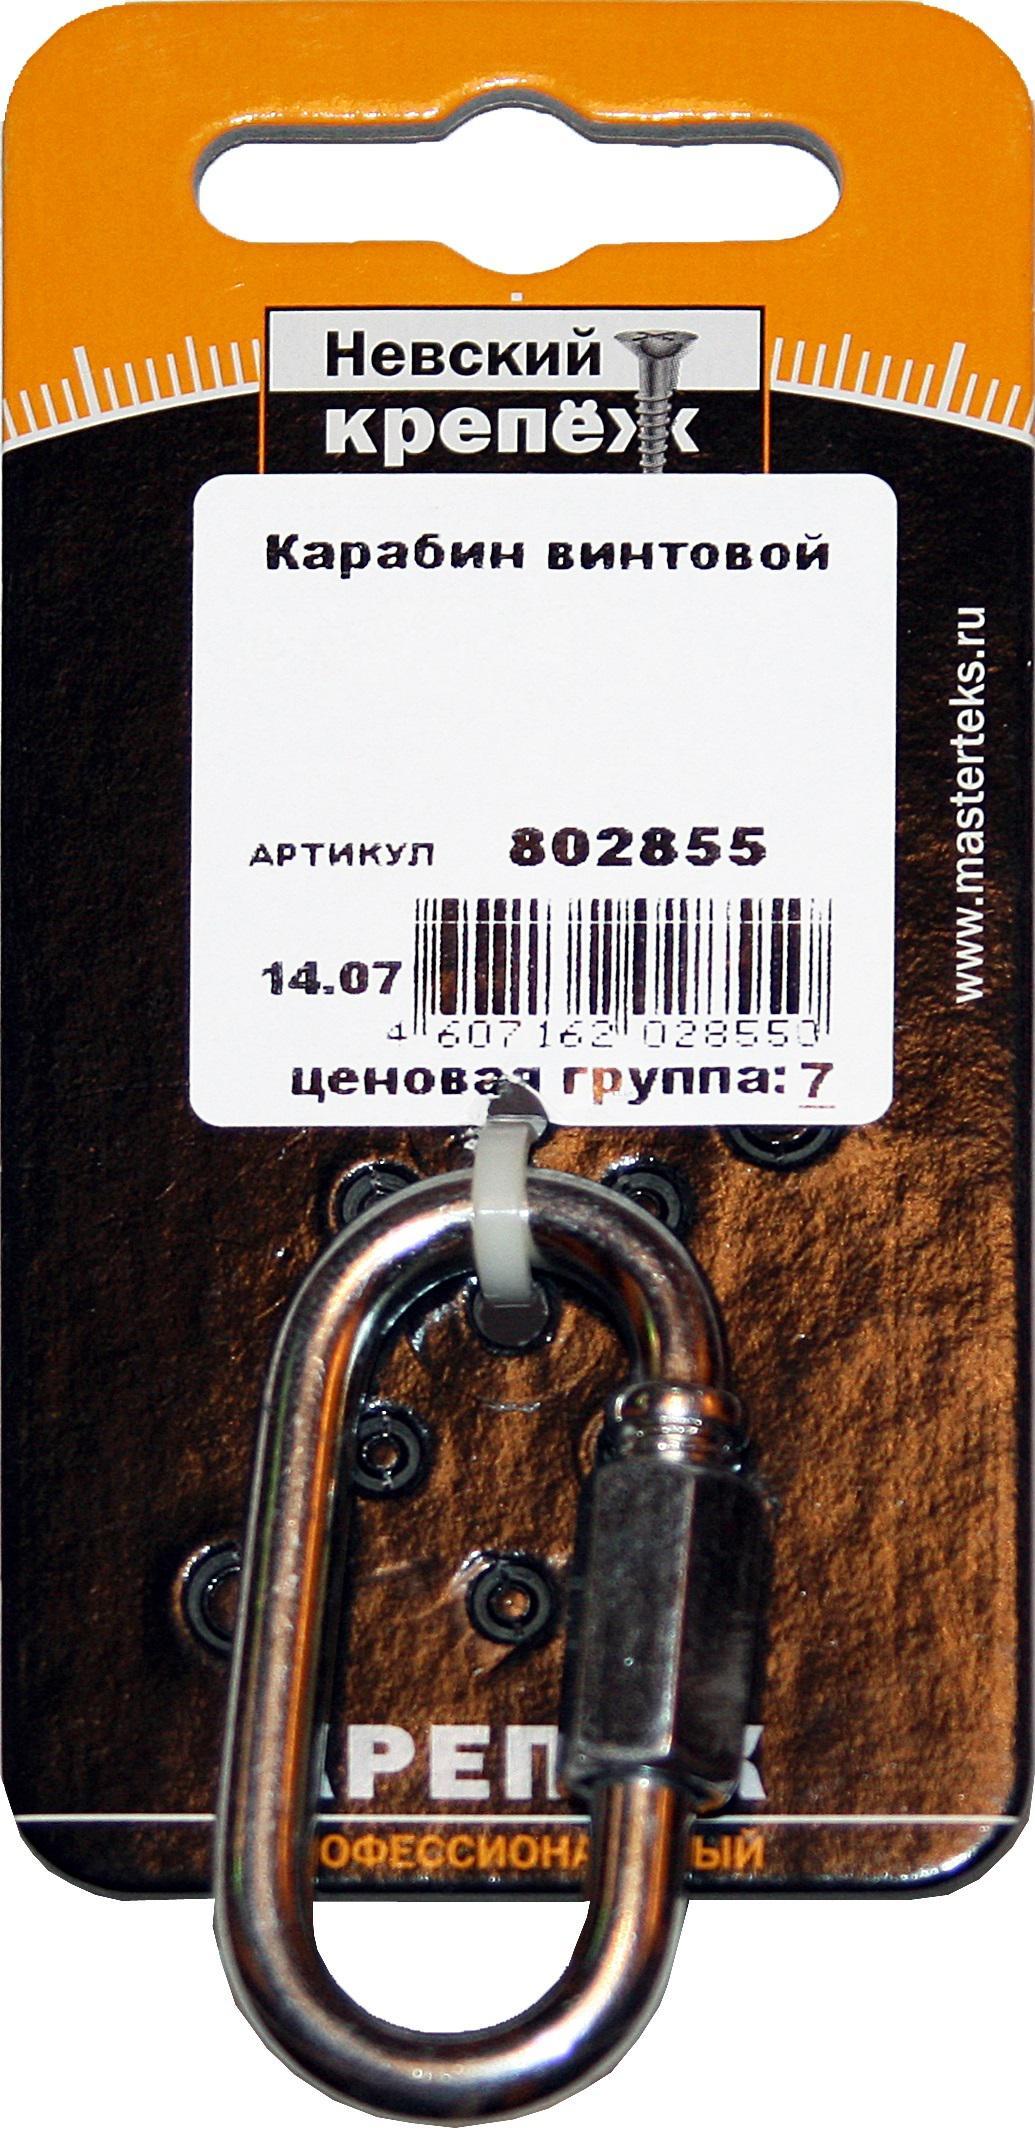 Карабин НЕВСКИЙ КРЕПЕЖ 802855